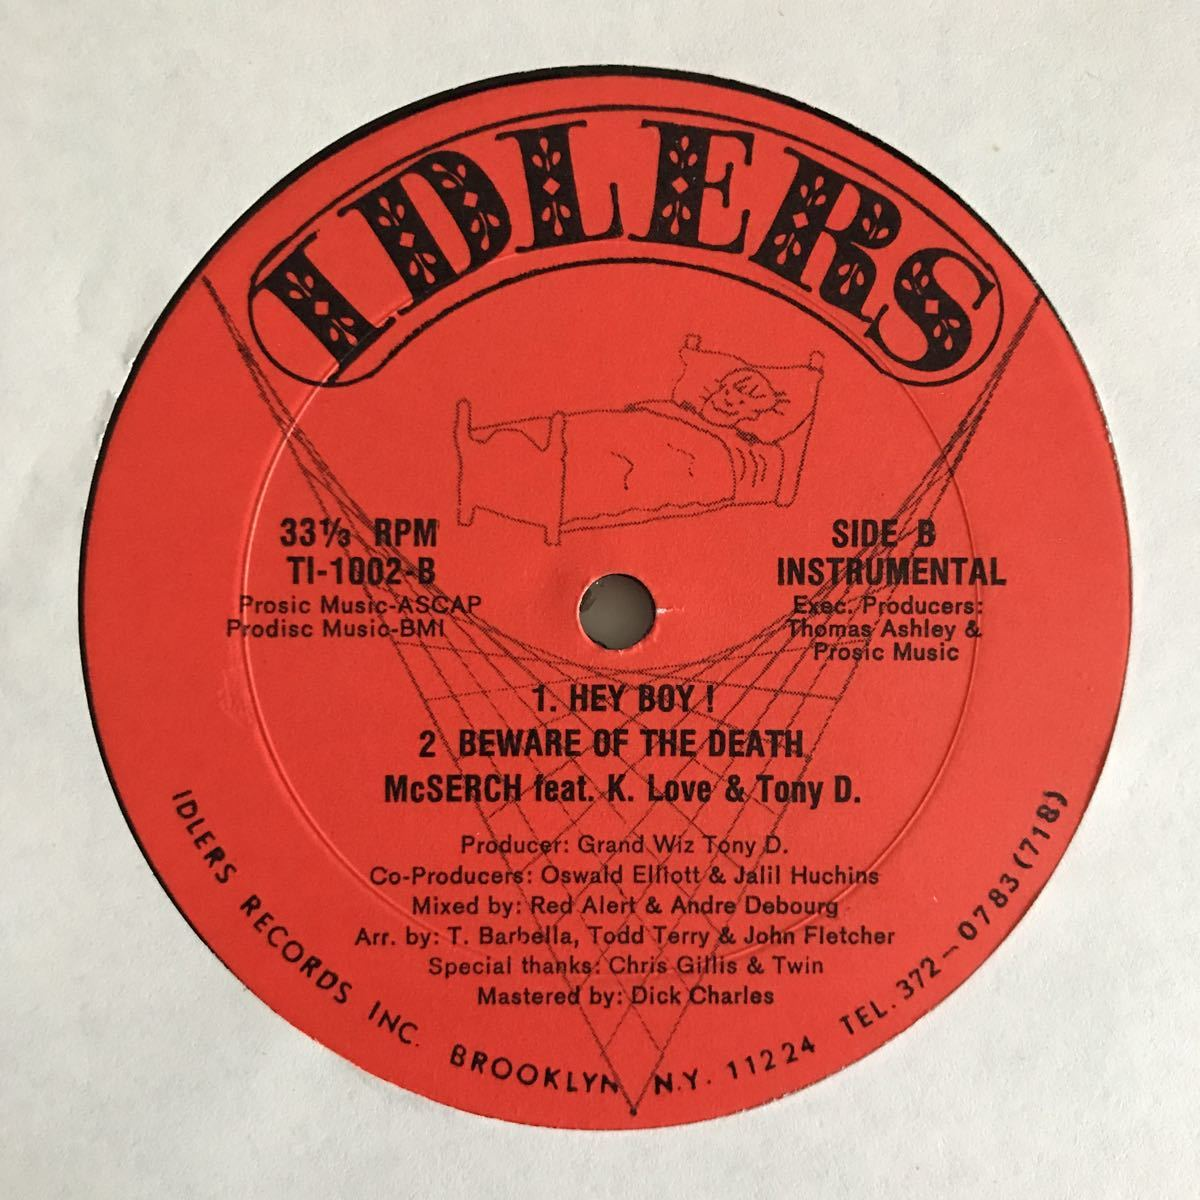 MC Serch Feat. K. Love & Tony D. - Hey Boy! / Beware Of The Death【US Orig.】【オリジナル】【Funkadelic/Brass Constructionネタ】_画像2